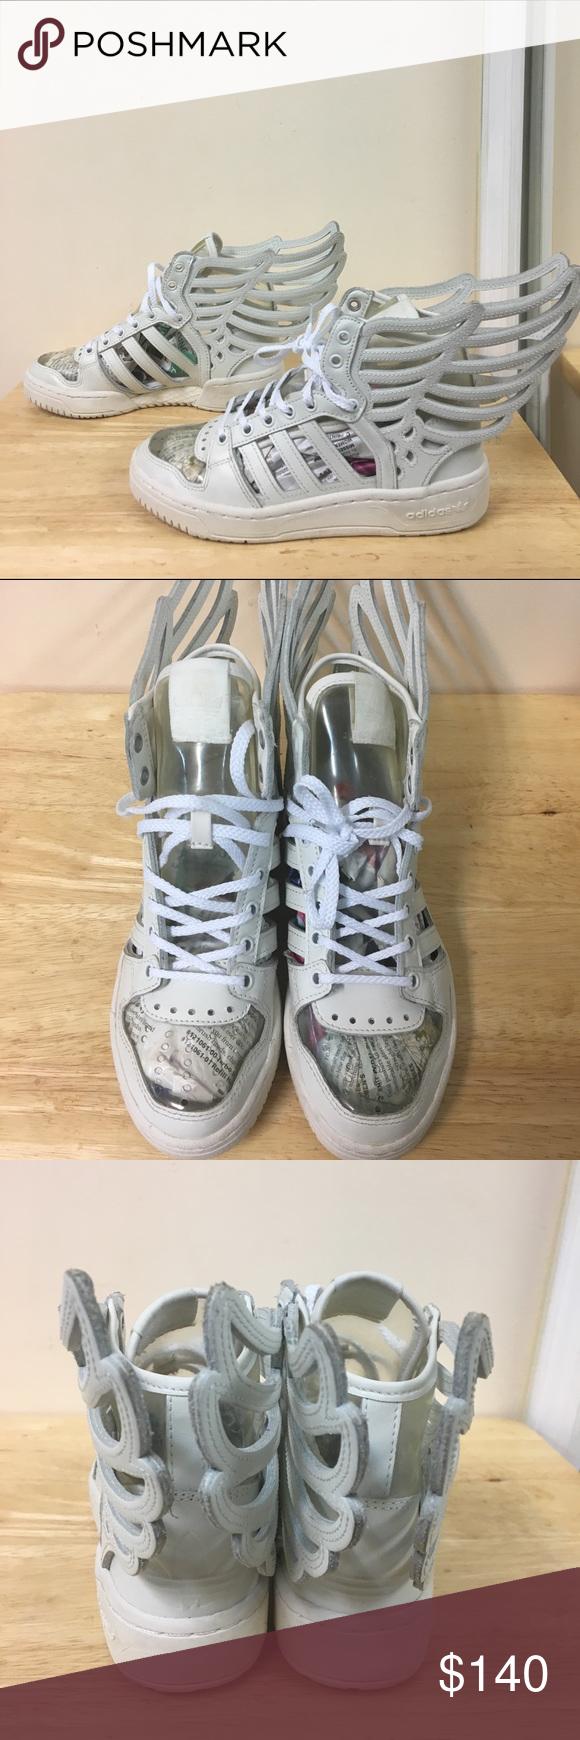 jeremy scott adidas originali chiara le ali jeremy scott